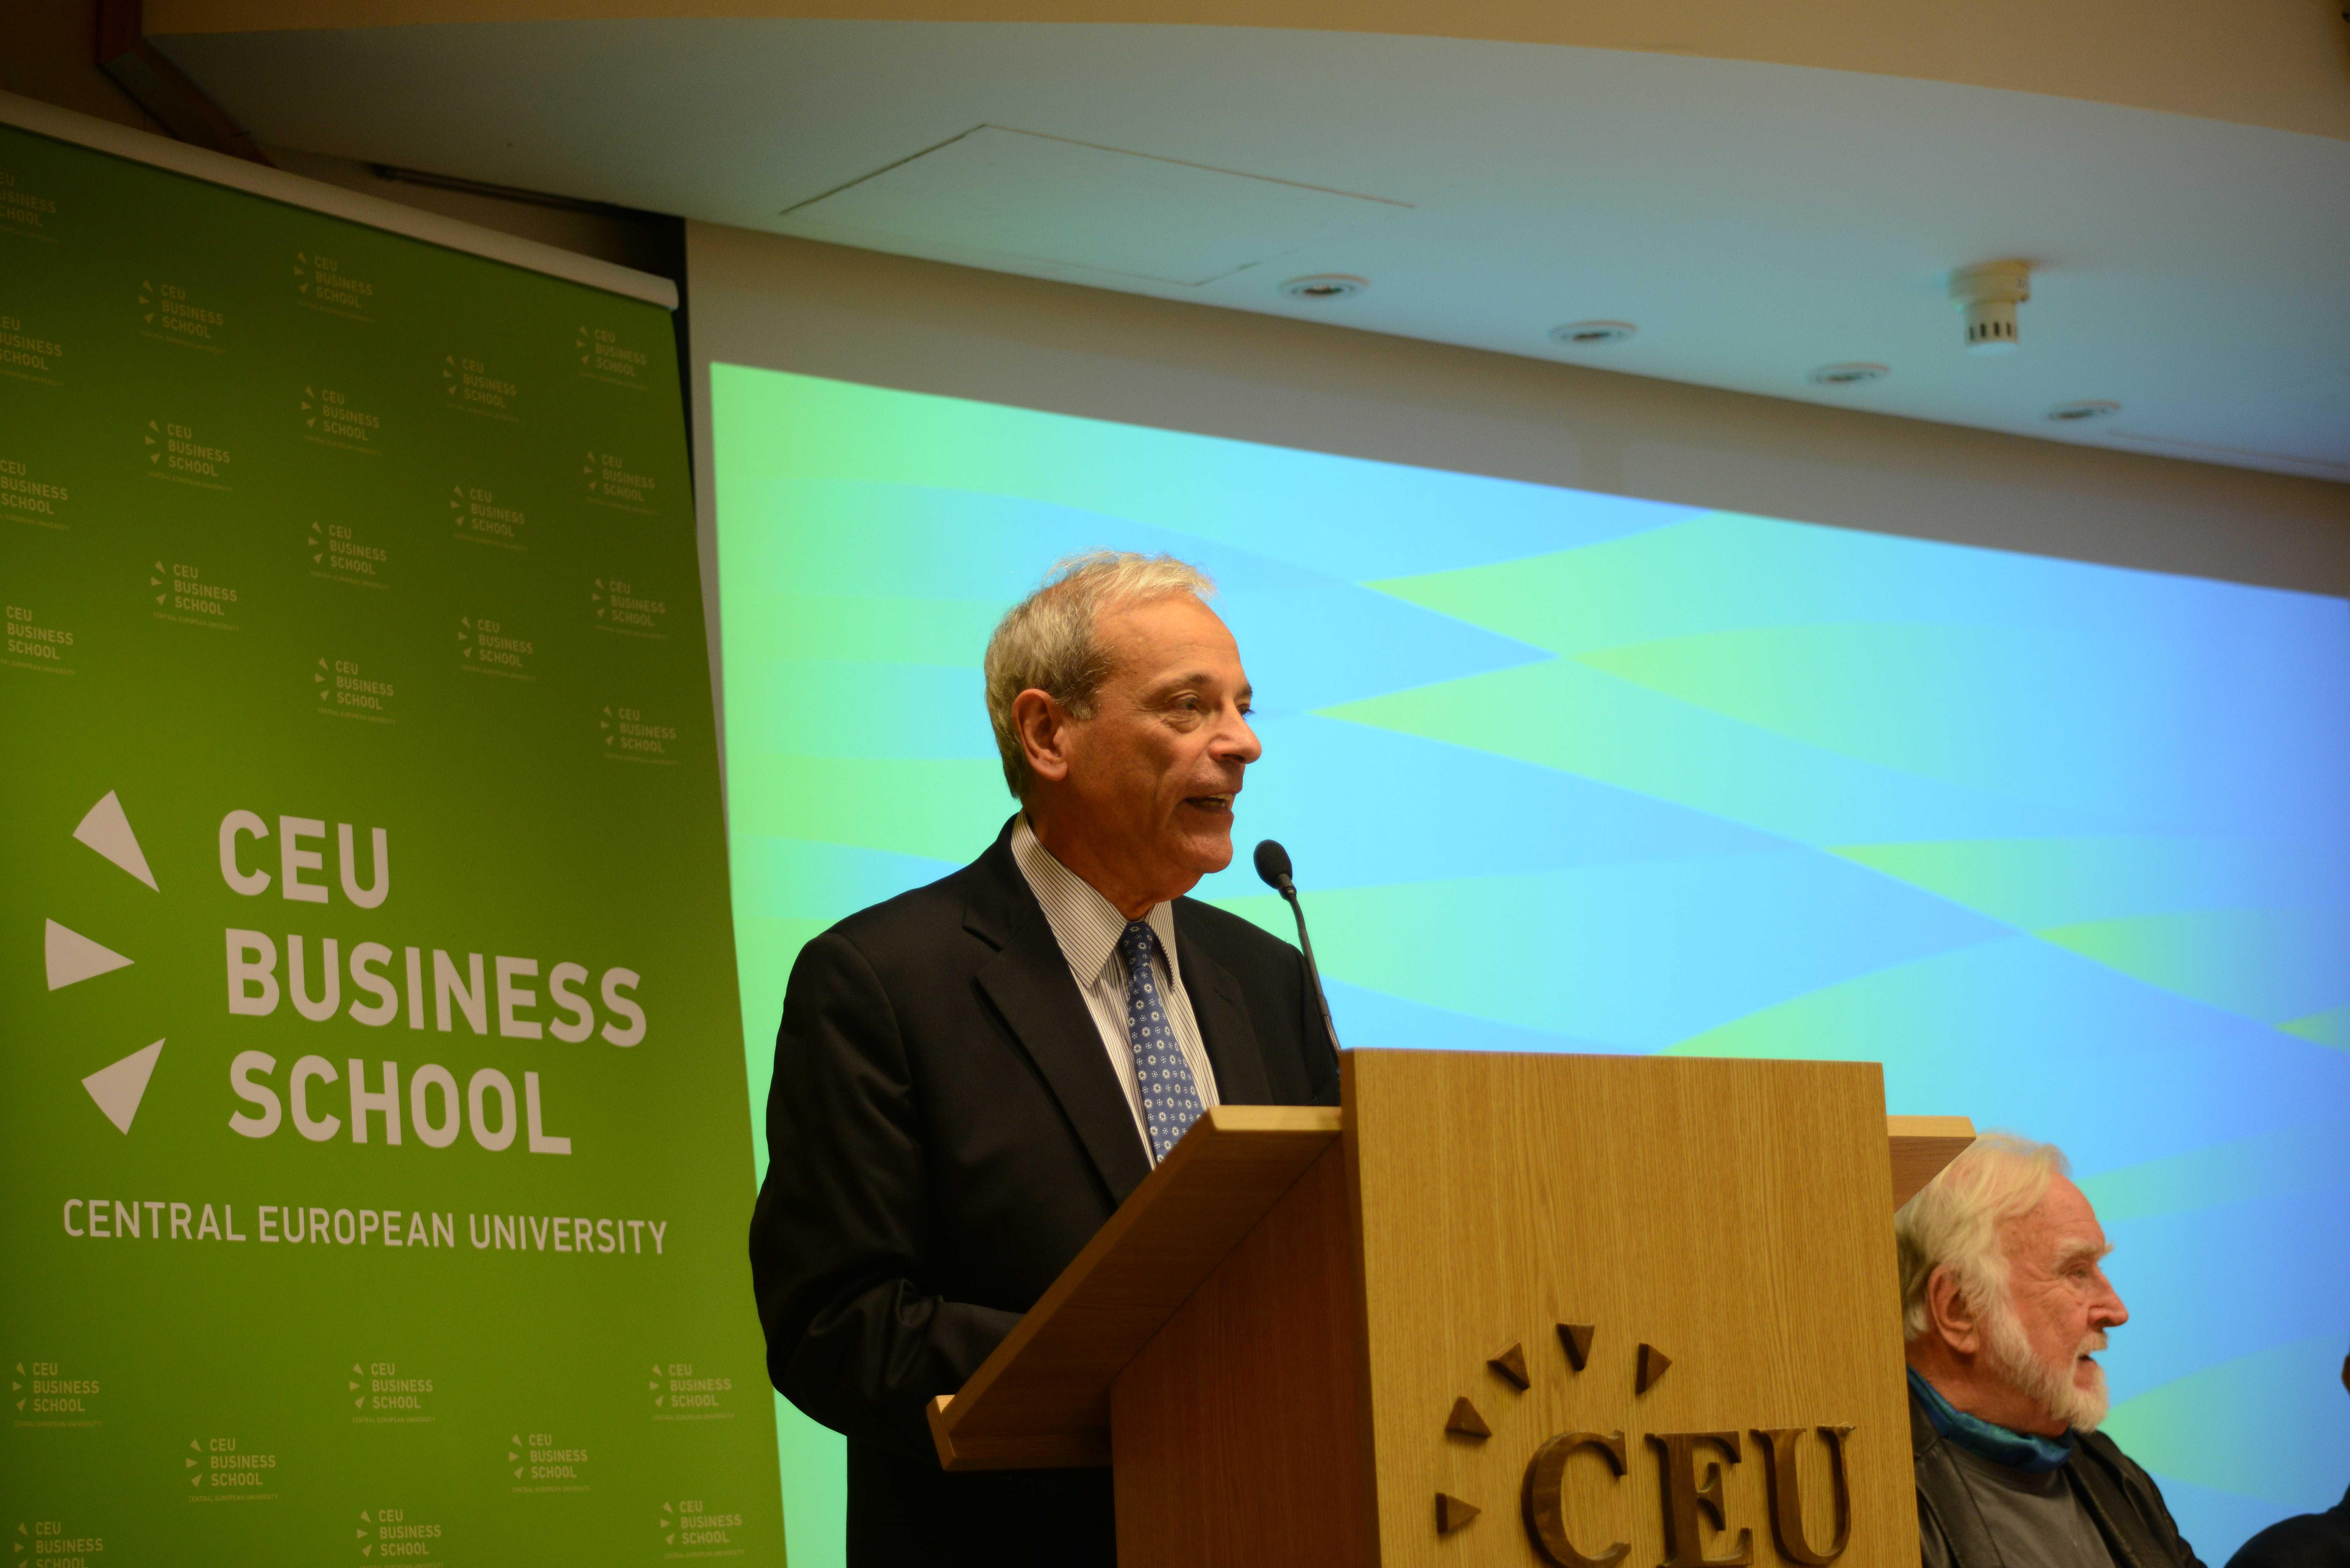 CEU Business School Dean Mel Horwitch, with Mihaly Csikszentmihalyi. Photo: Edina Ligeti.